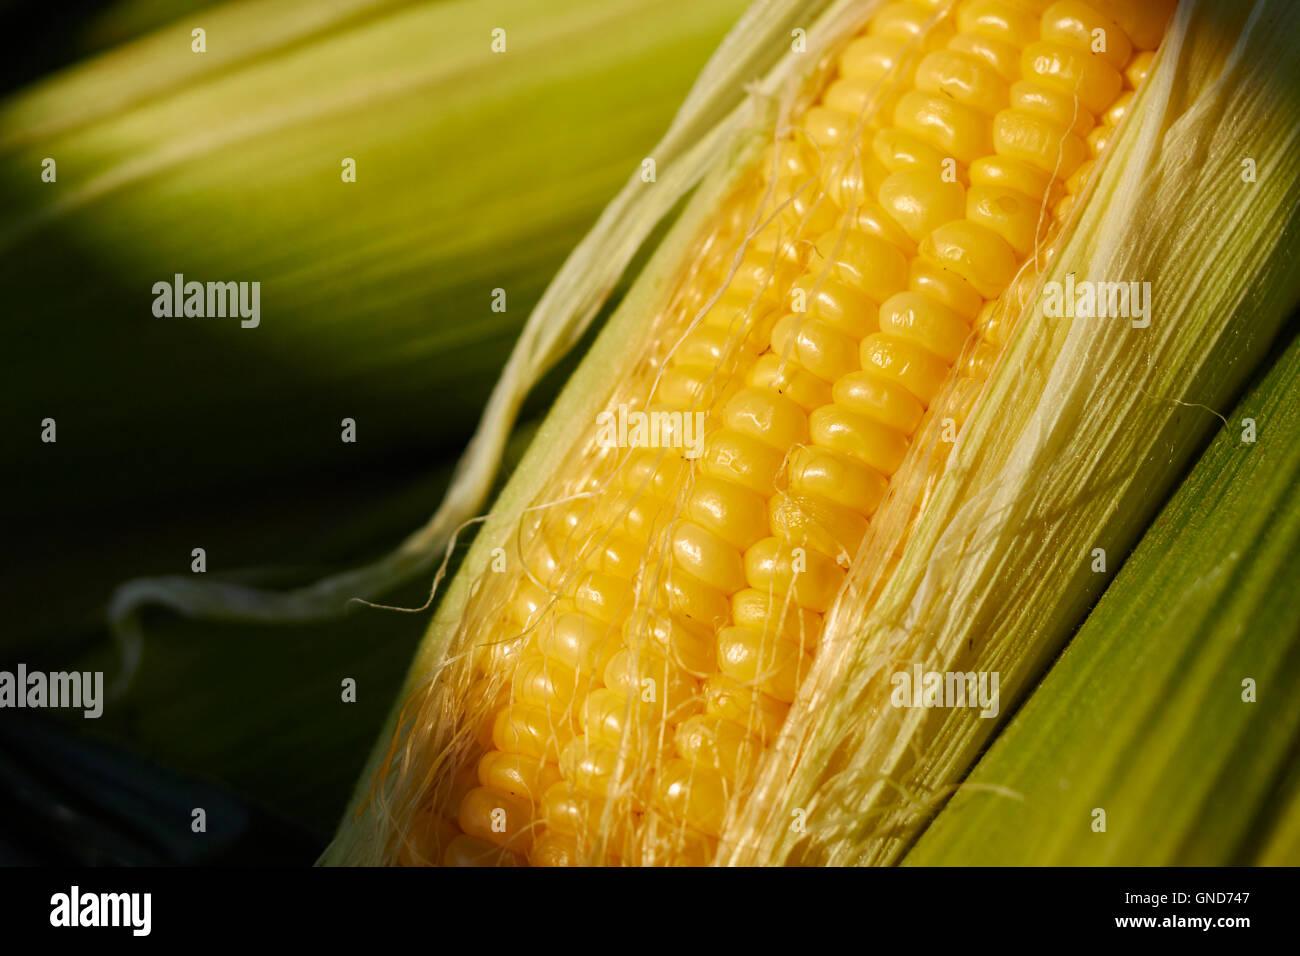 Ear of sweet corn at a Pennsylvania USA farmer's market - Stock Image